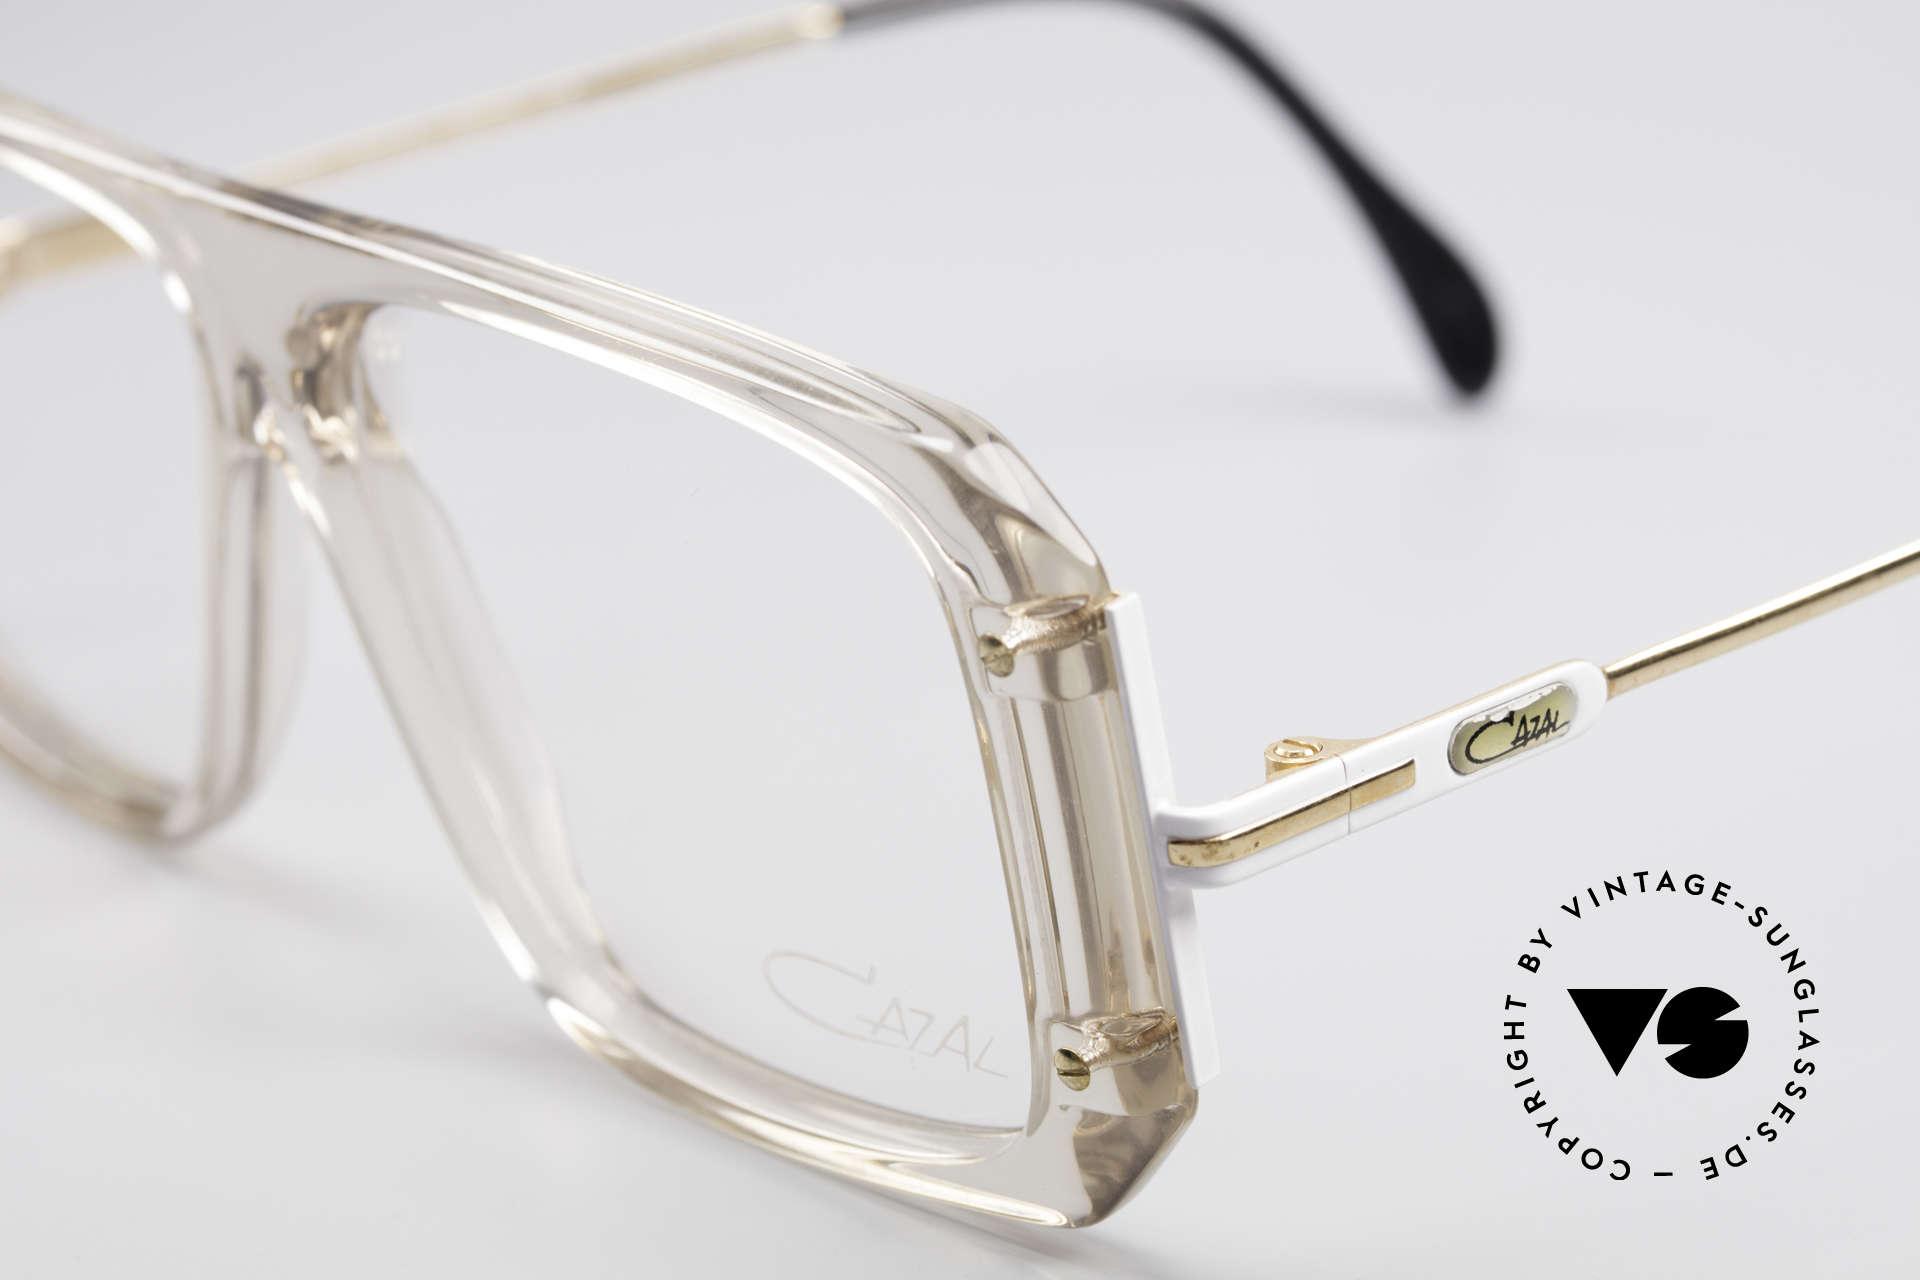 Cazal 633 Vintage Celebrity Eyeglasses, unworn, NOS (like all our rare vintage Cazal eyewear), Made for Men